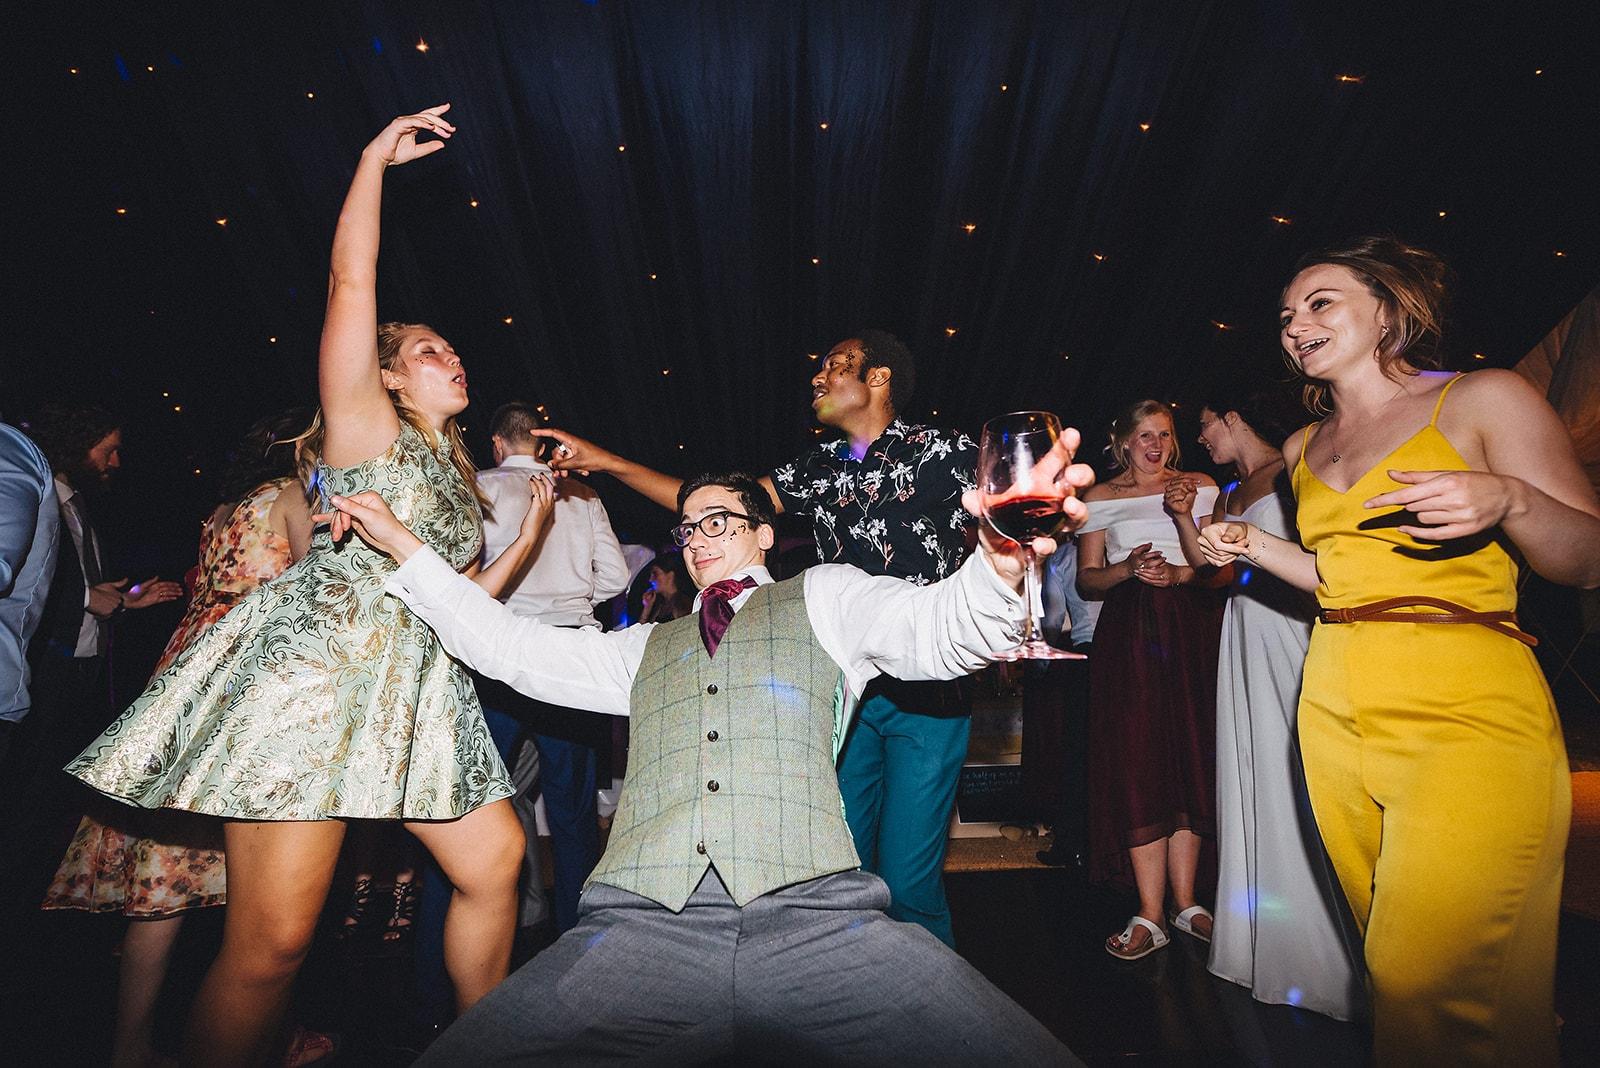 Wedding guests dancing at a cambridge farm marquee wedding